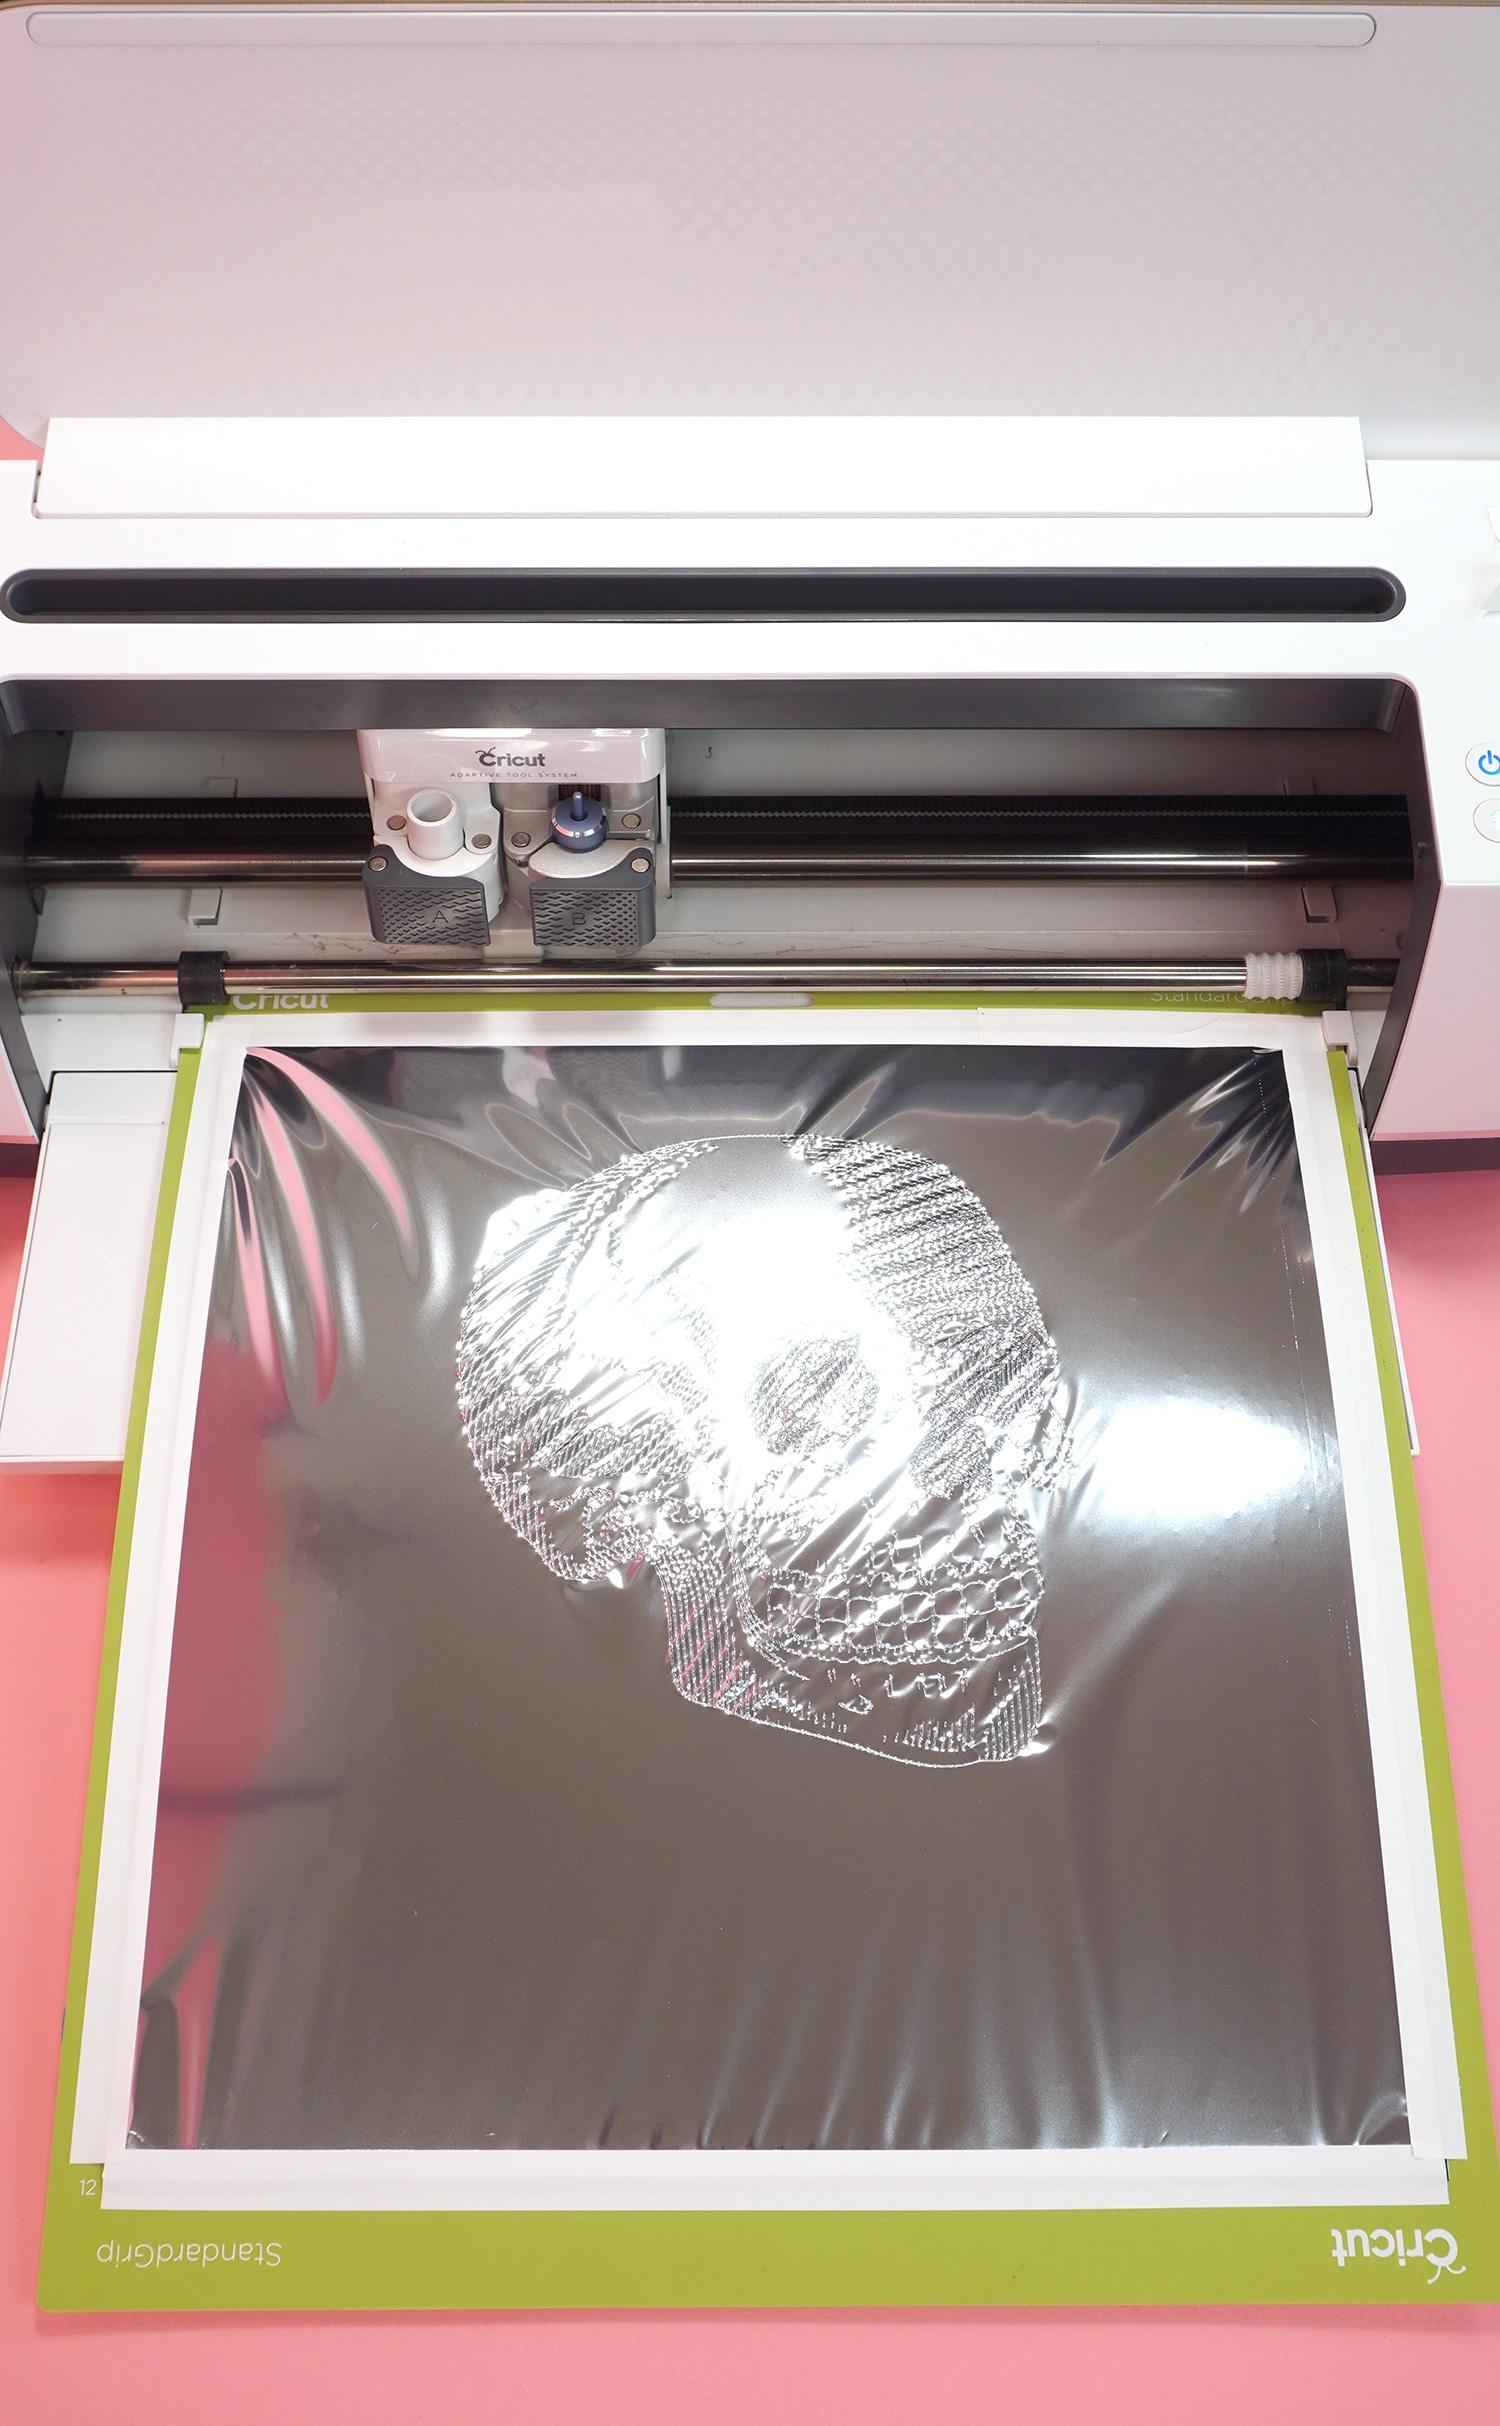 Silver foil with skull design on Cricut mat in Cricut Maker machine